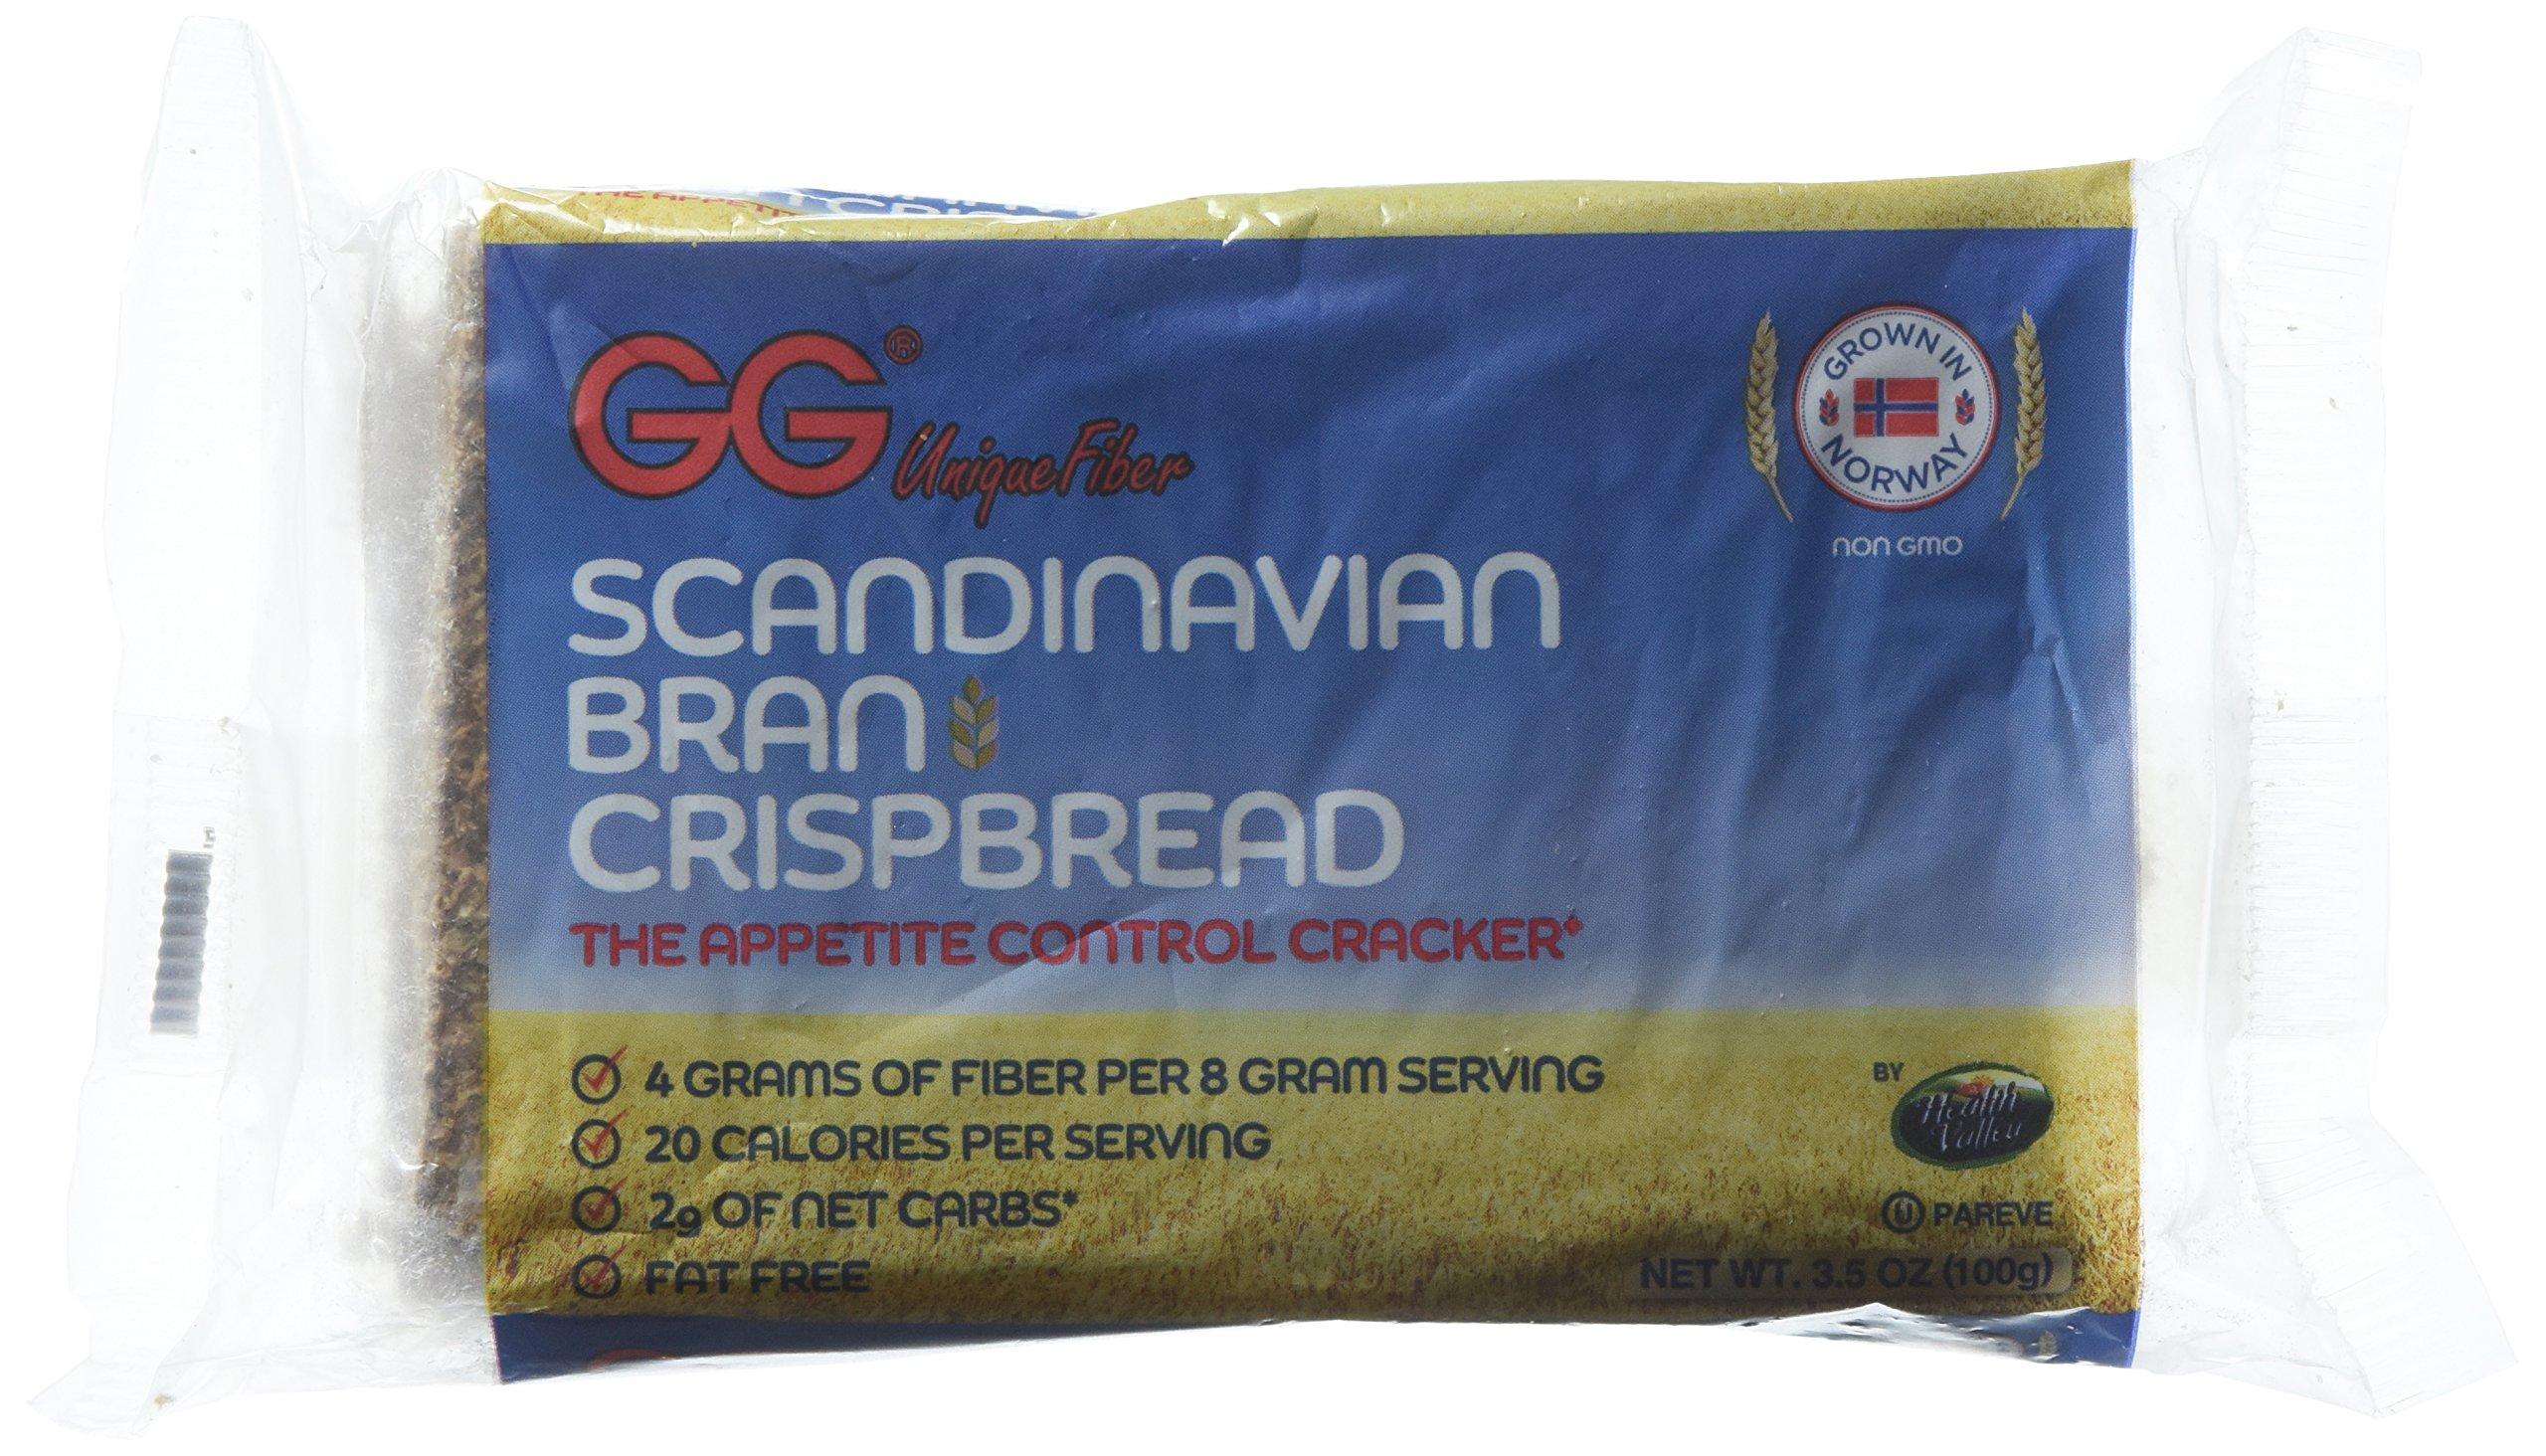 Health Valley Crispbread Gg Bran, 3.5 Ounce, Pack of 10